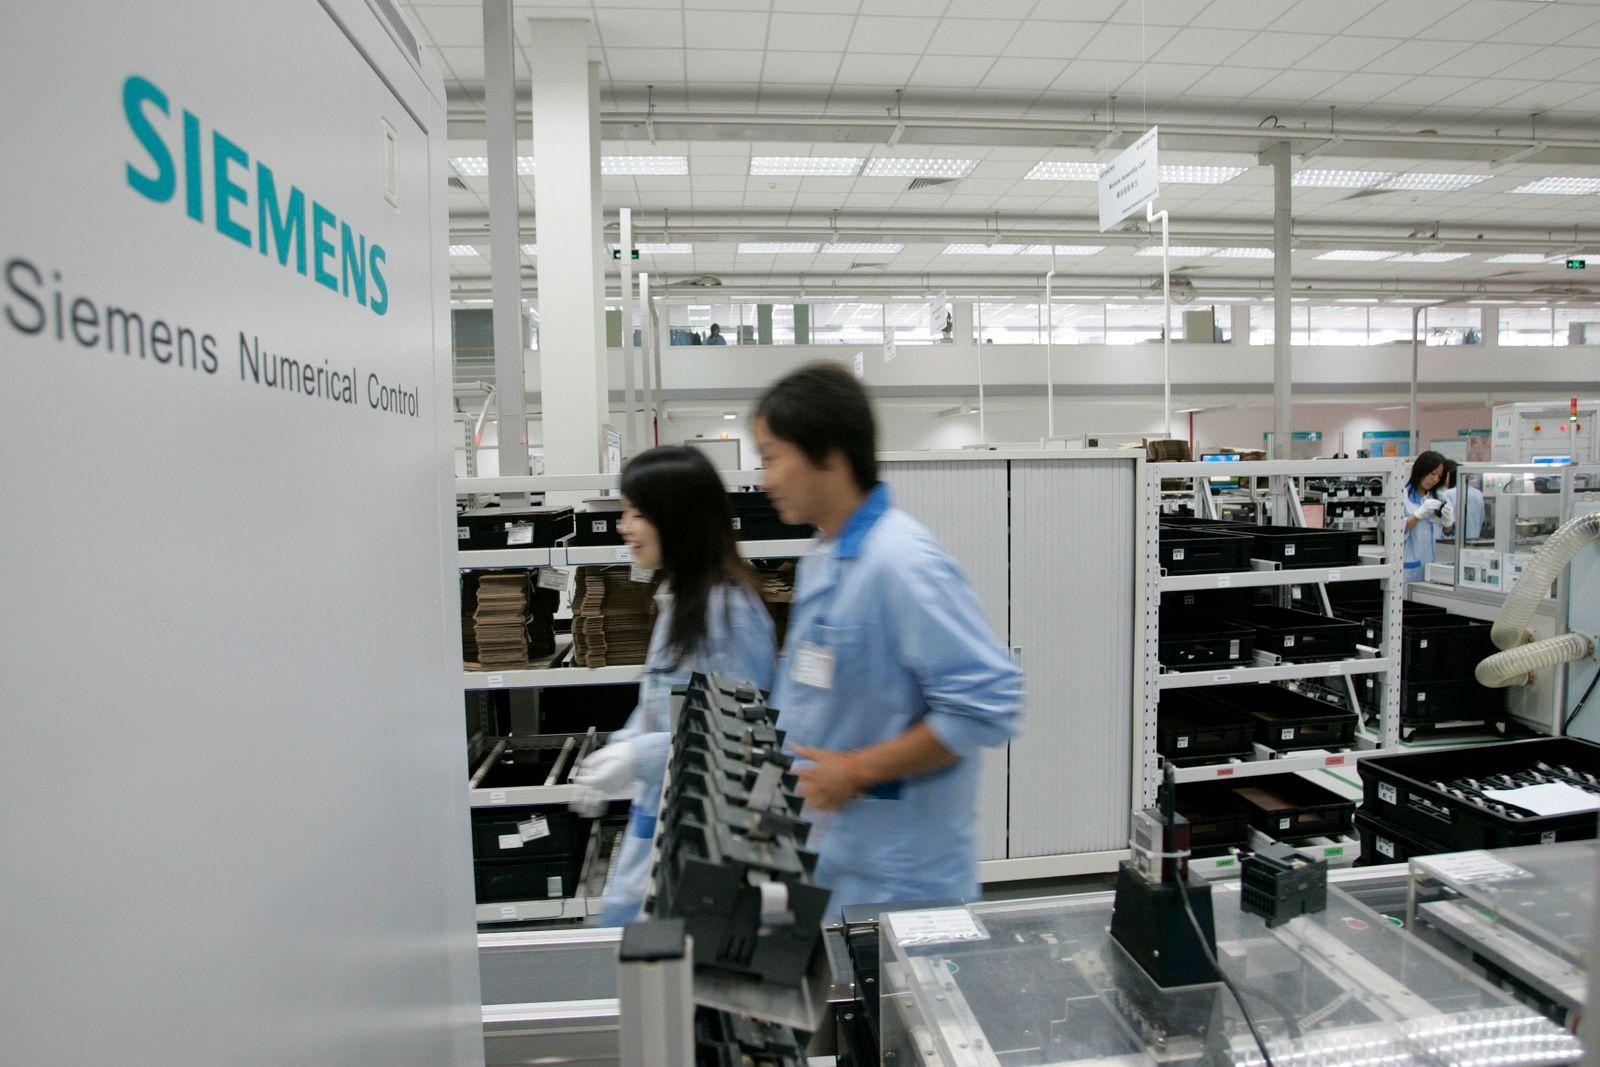 Siemens in China / Arbeiter im Werk / Fabrik in Nanjing